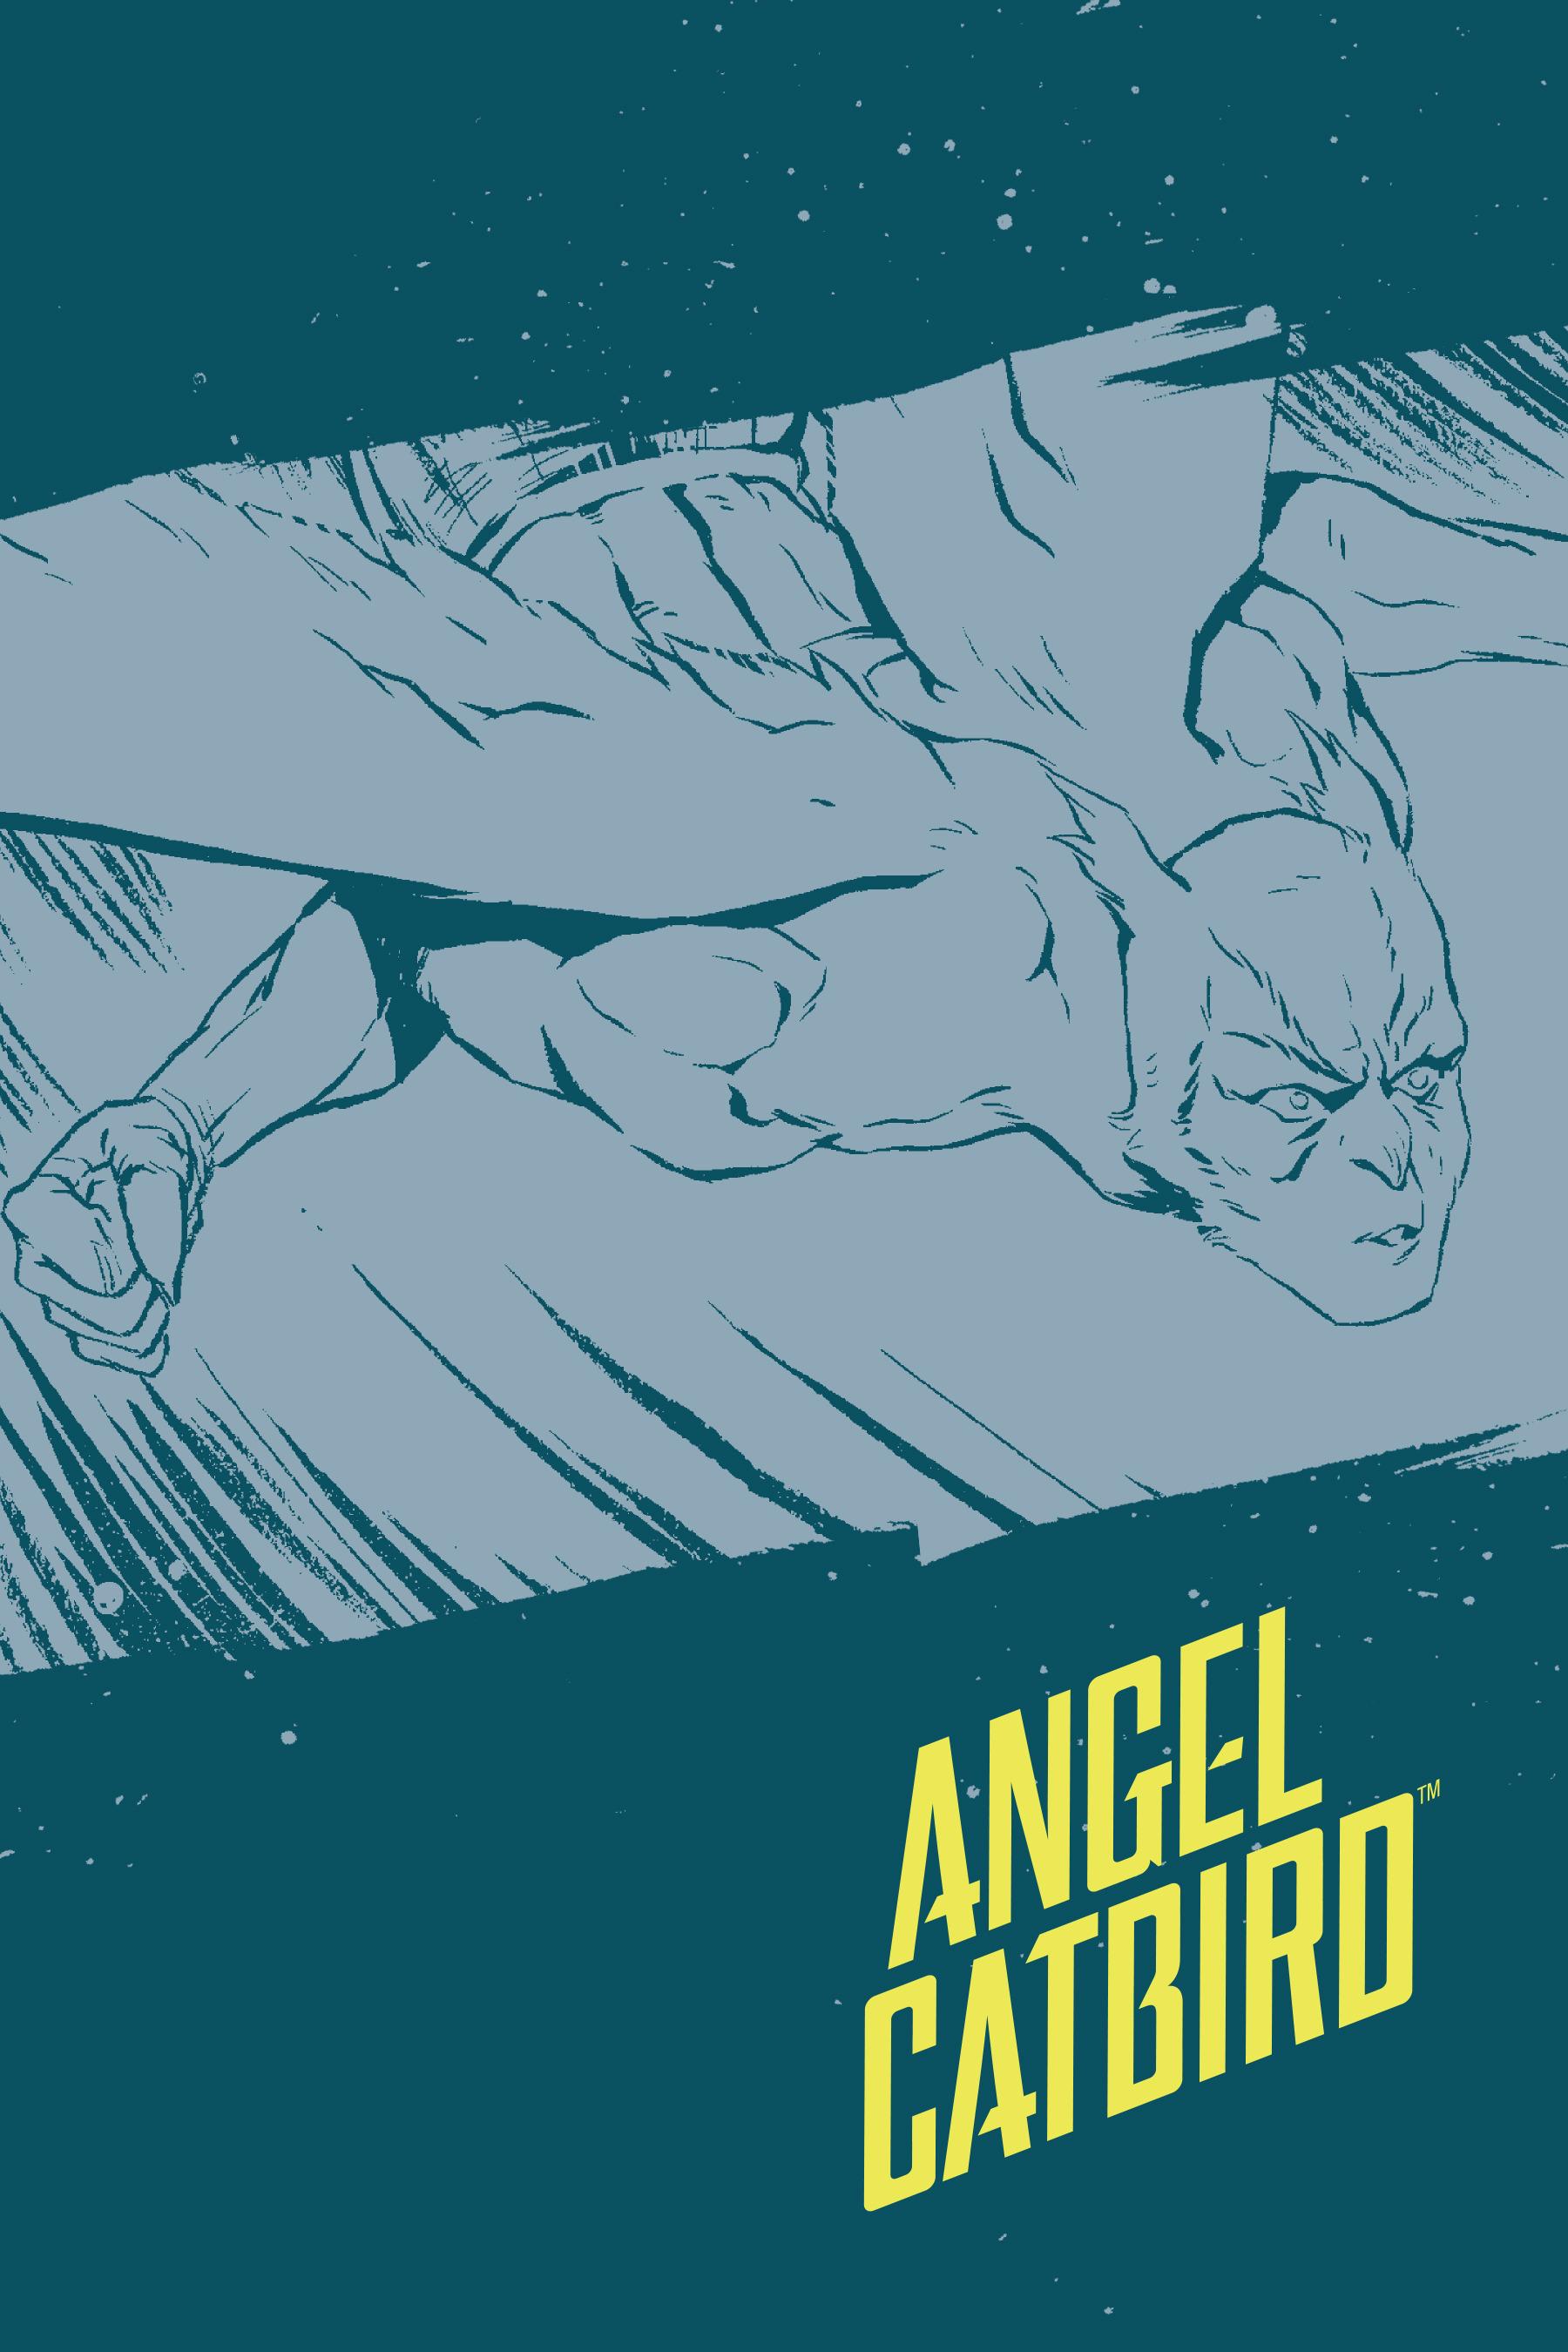 Read online Angel Catbird comic -  Issue # TPB 2 - 3